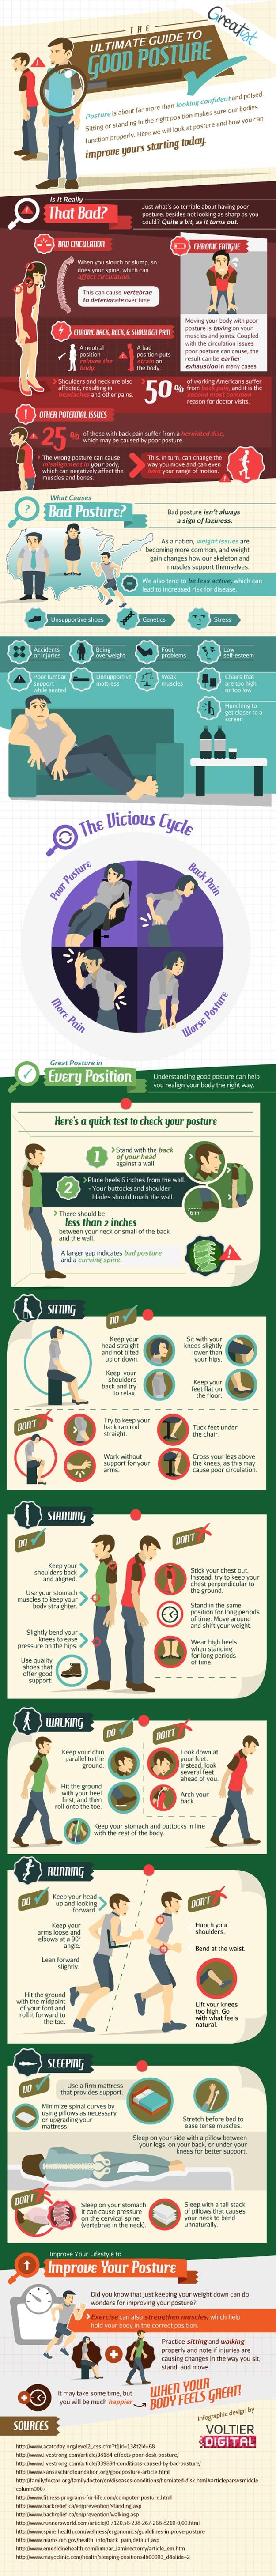 geek-guide-improving-bad-posture